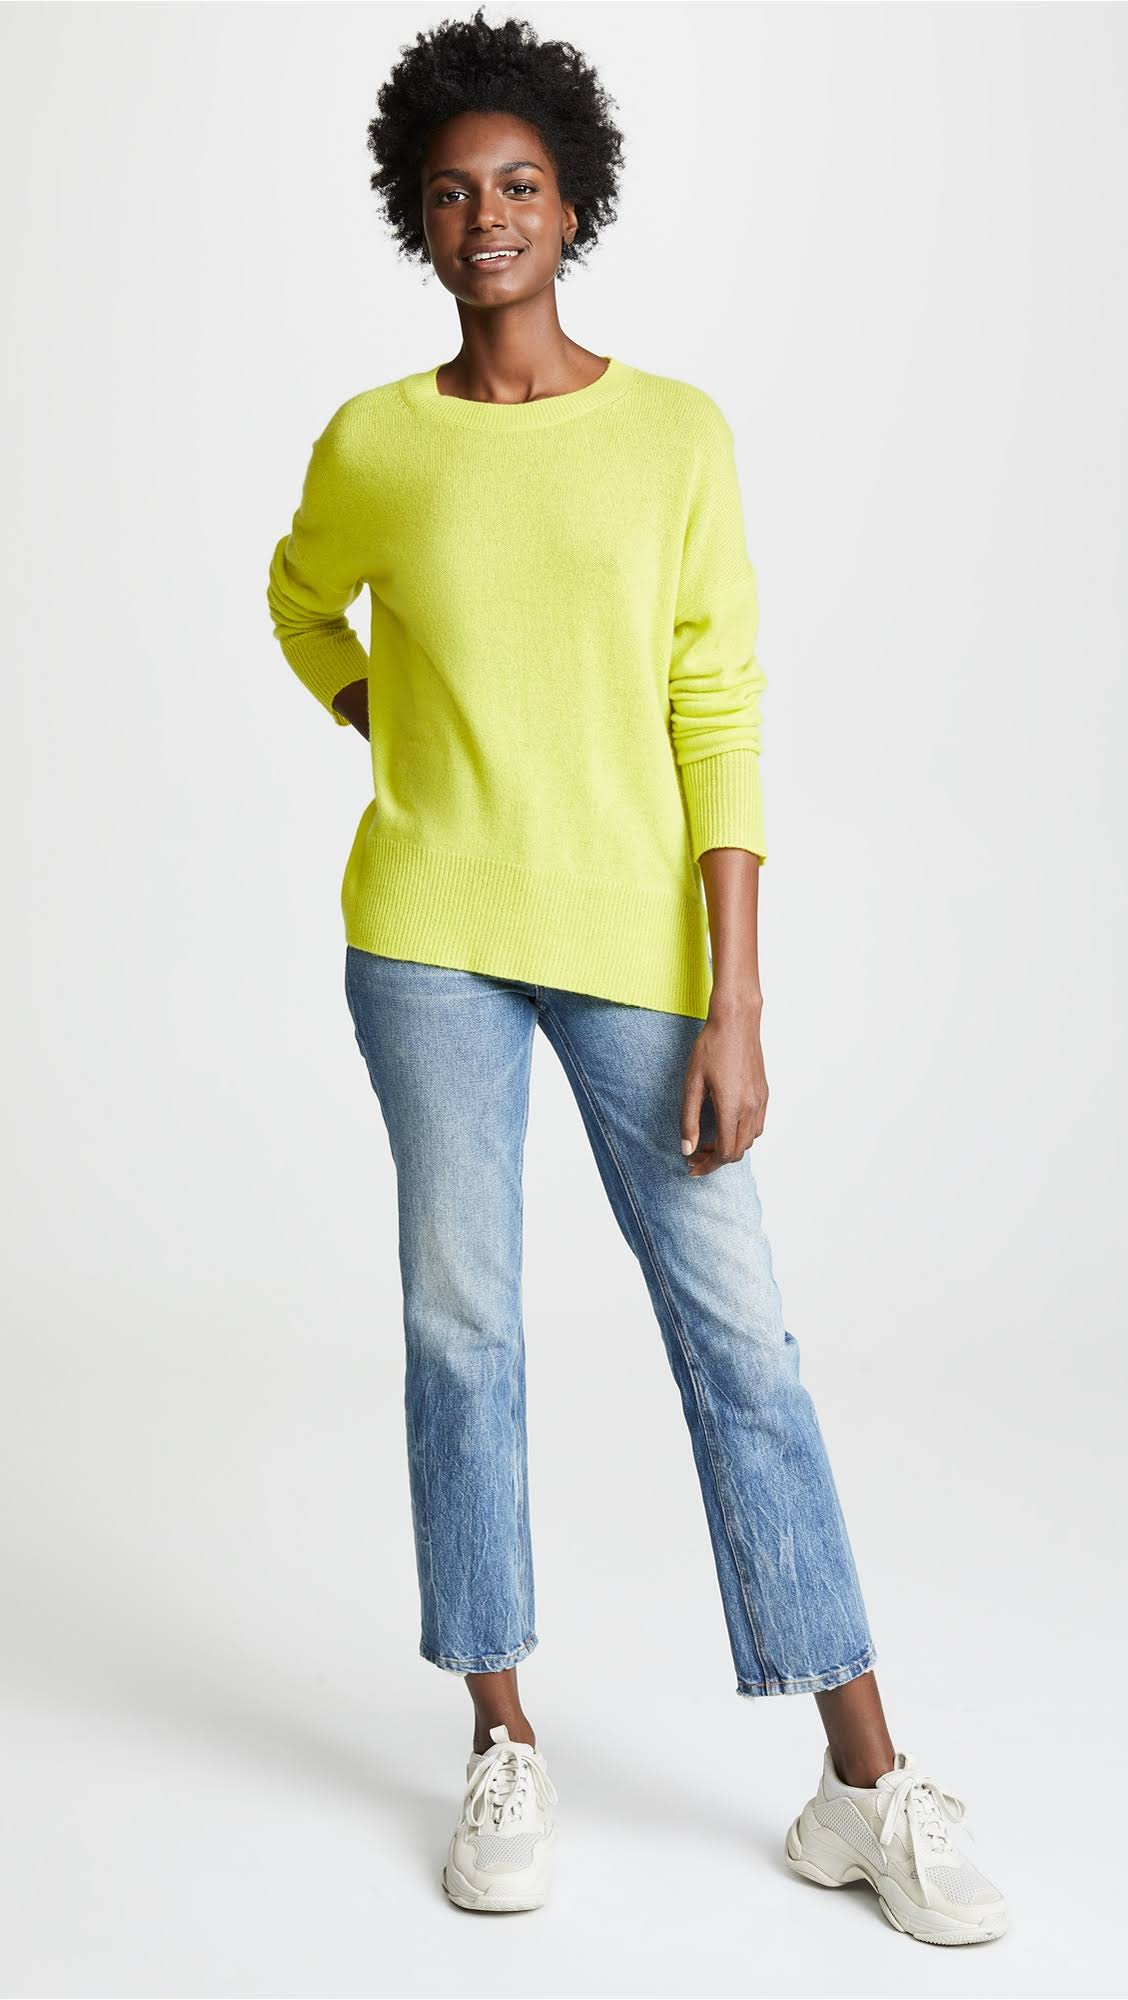 Sweater Theorie Sweater Karenia Theorie Theorie Karenia Cashmere Cashmere H4xwUq0